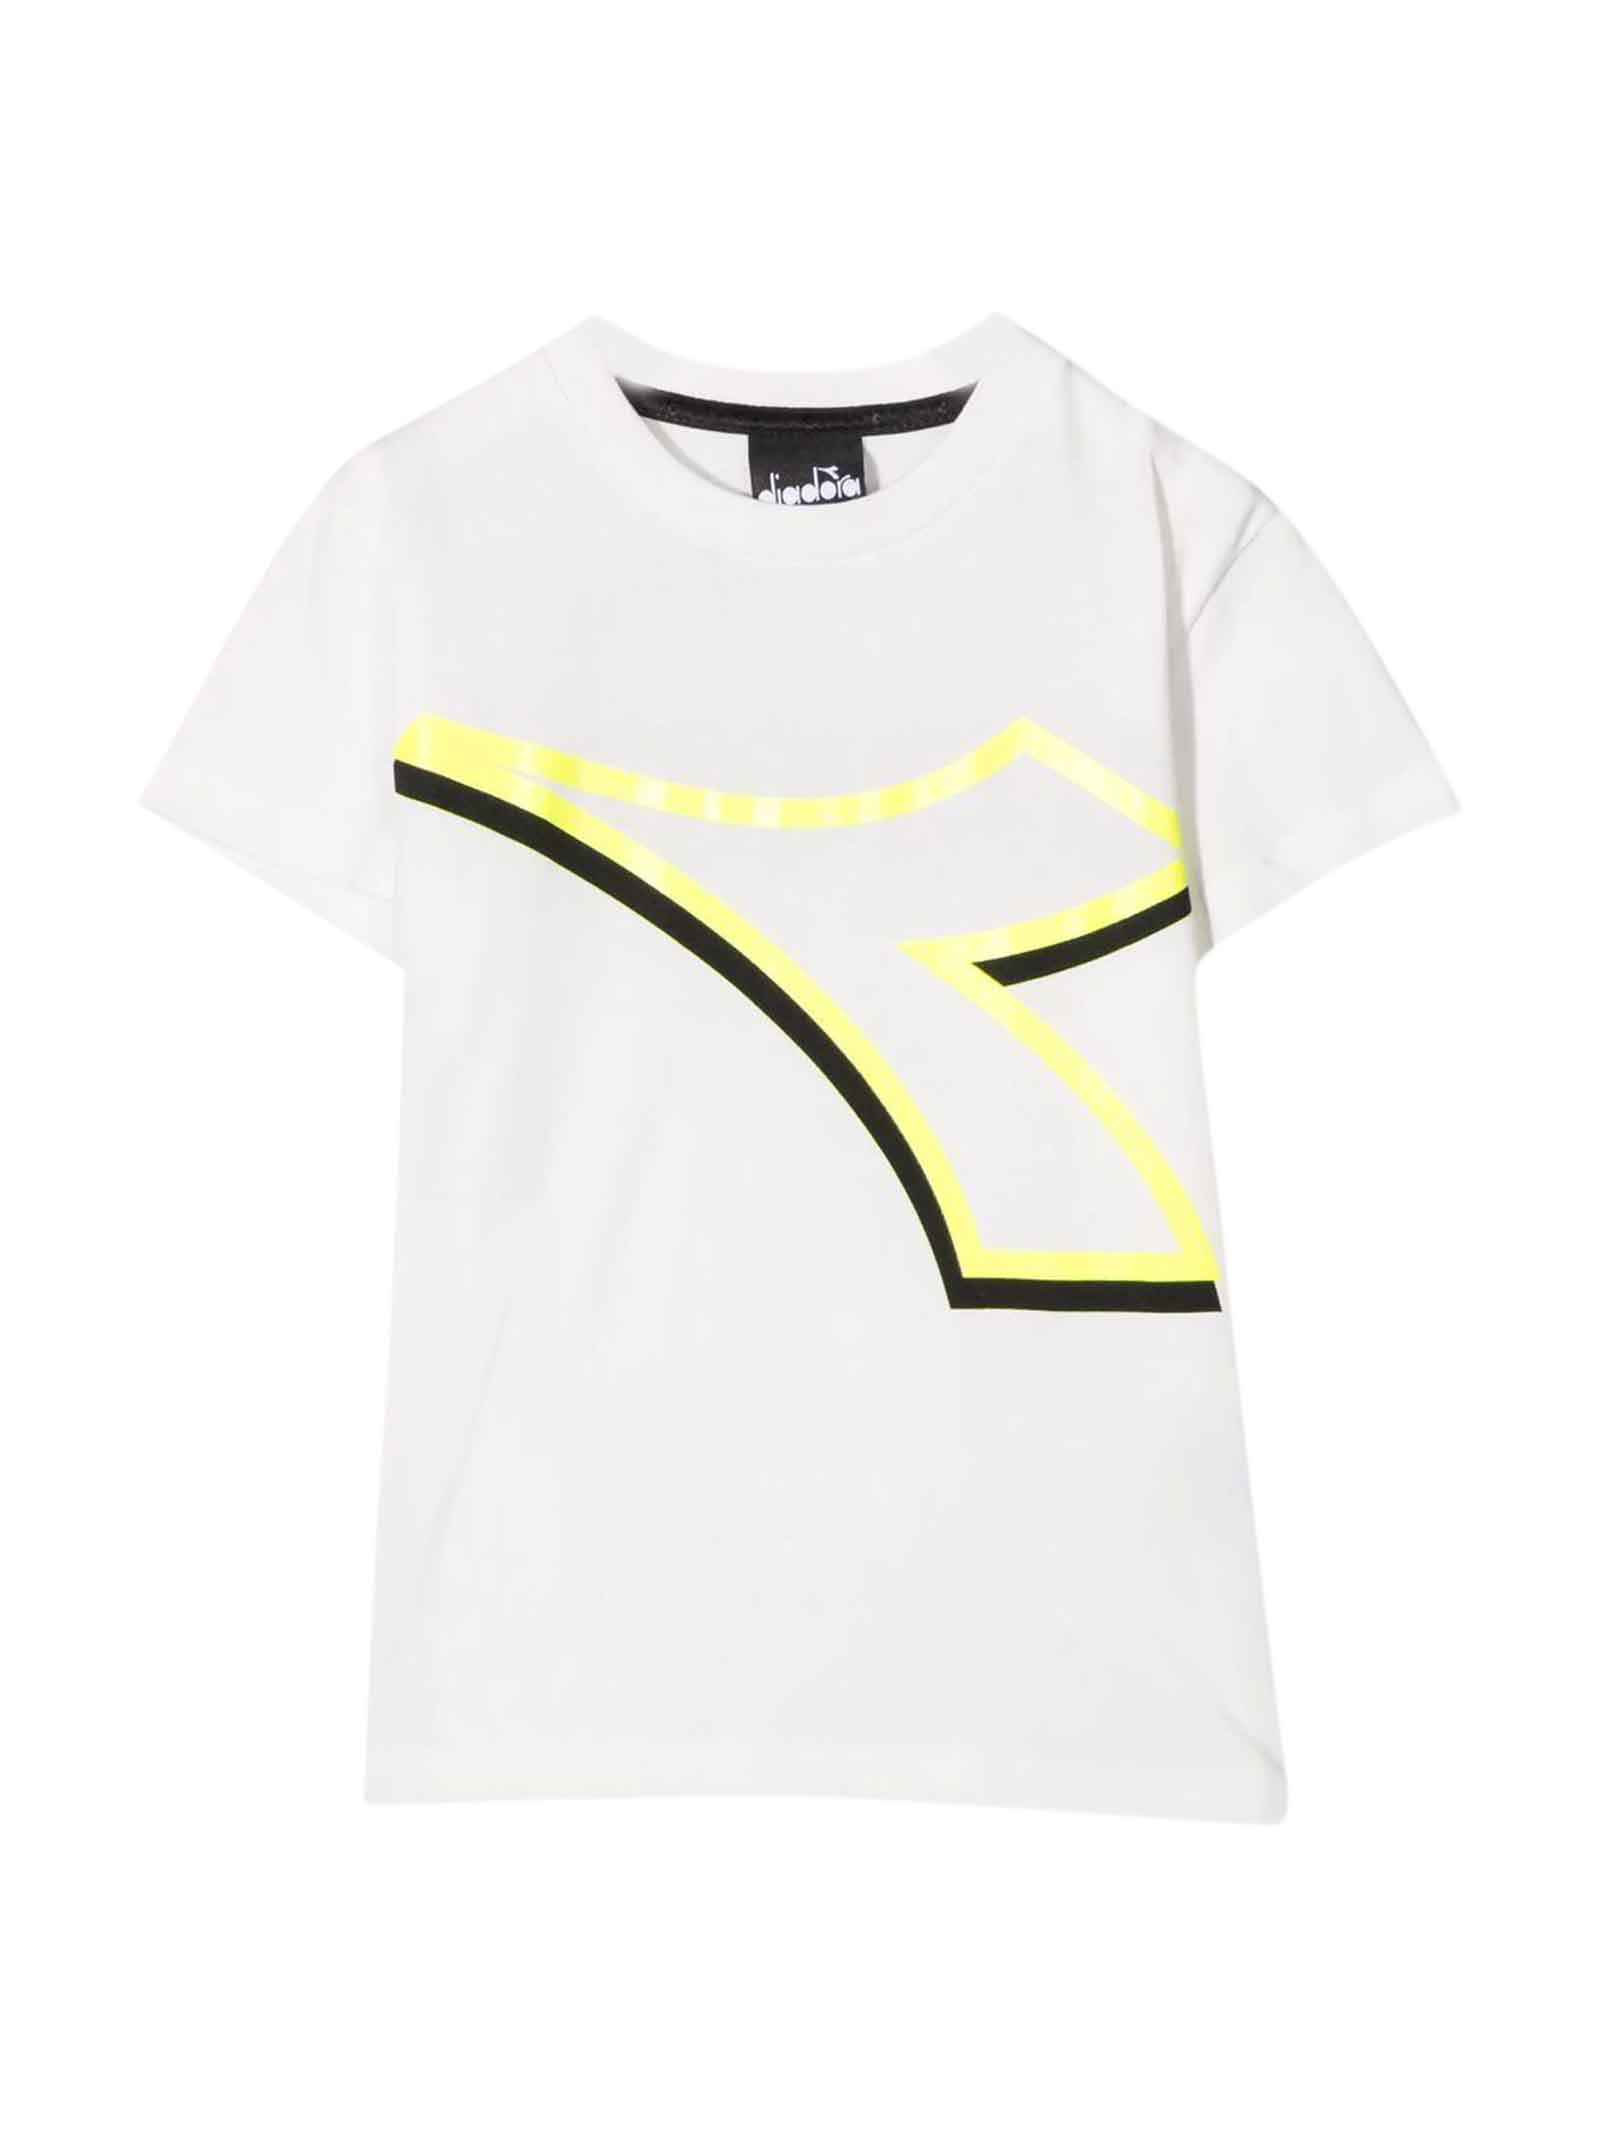 White Teen T-shirt